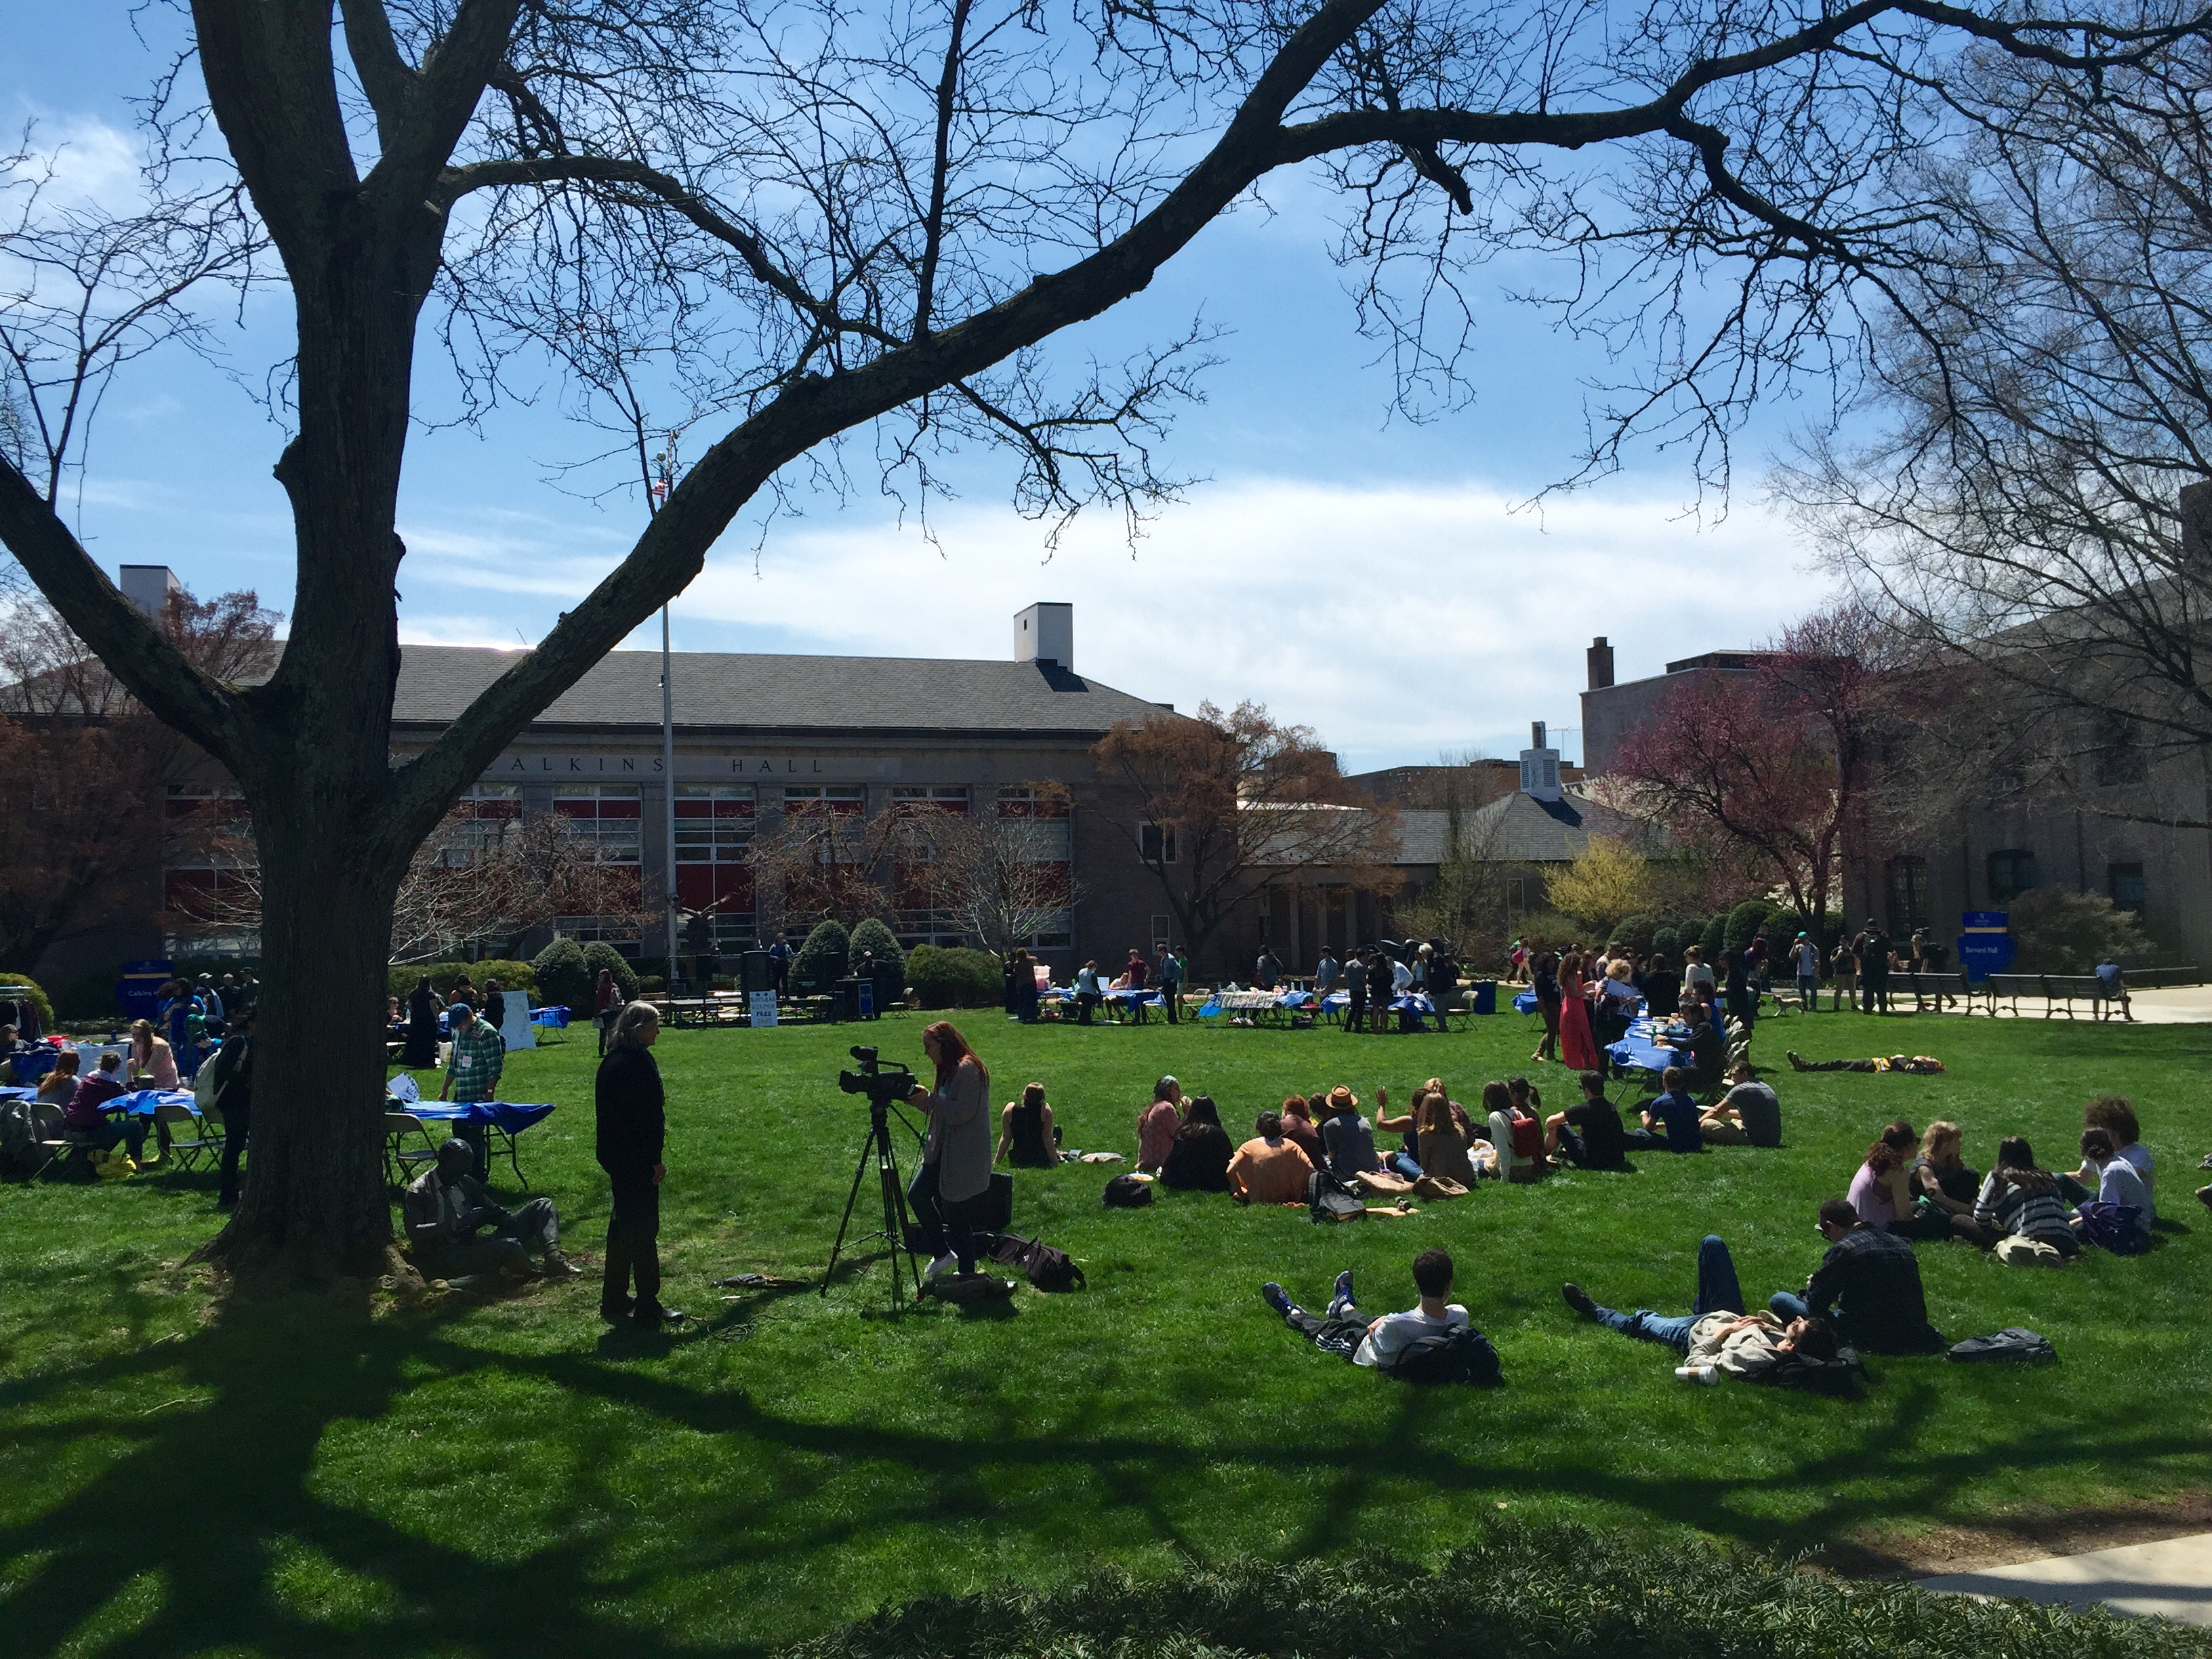 Campus Enjoys Outdoor Earth Day Festival, Farmers Market